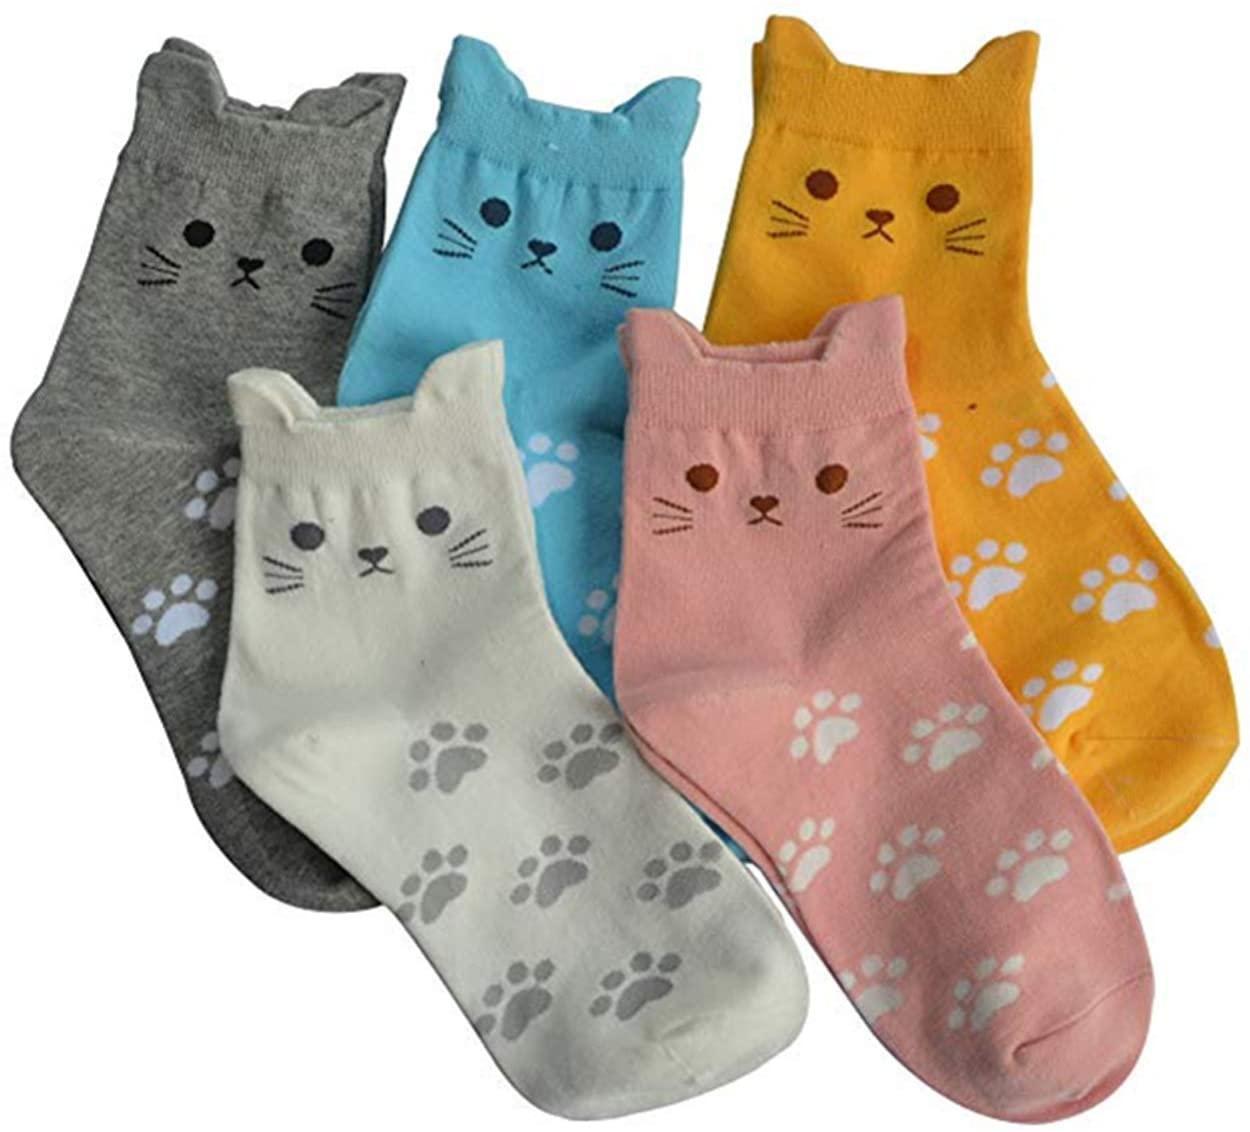 Micrkrowen 5 Pairs Women's Fun Socks Cute Cat Animals Funny Funky Novelty Cotton Gift (Cute Cat)